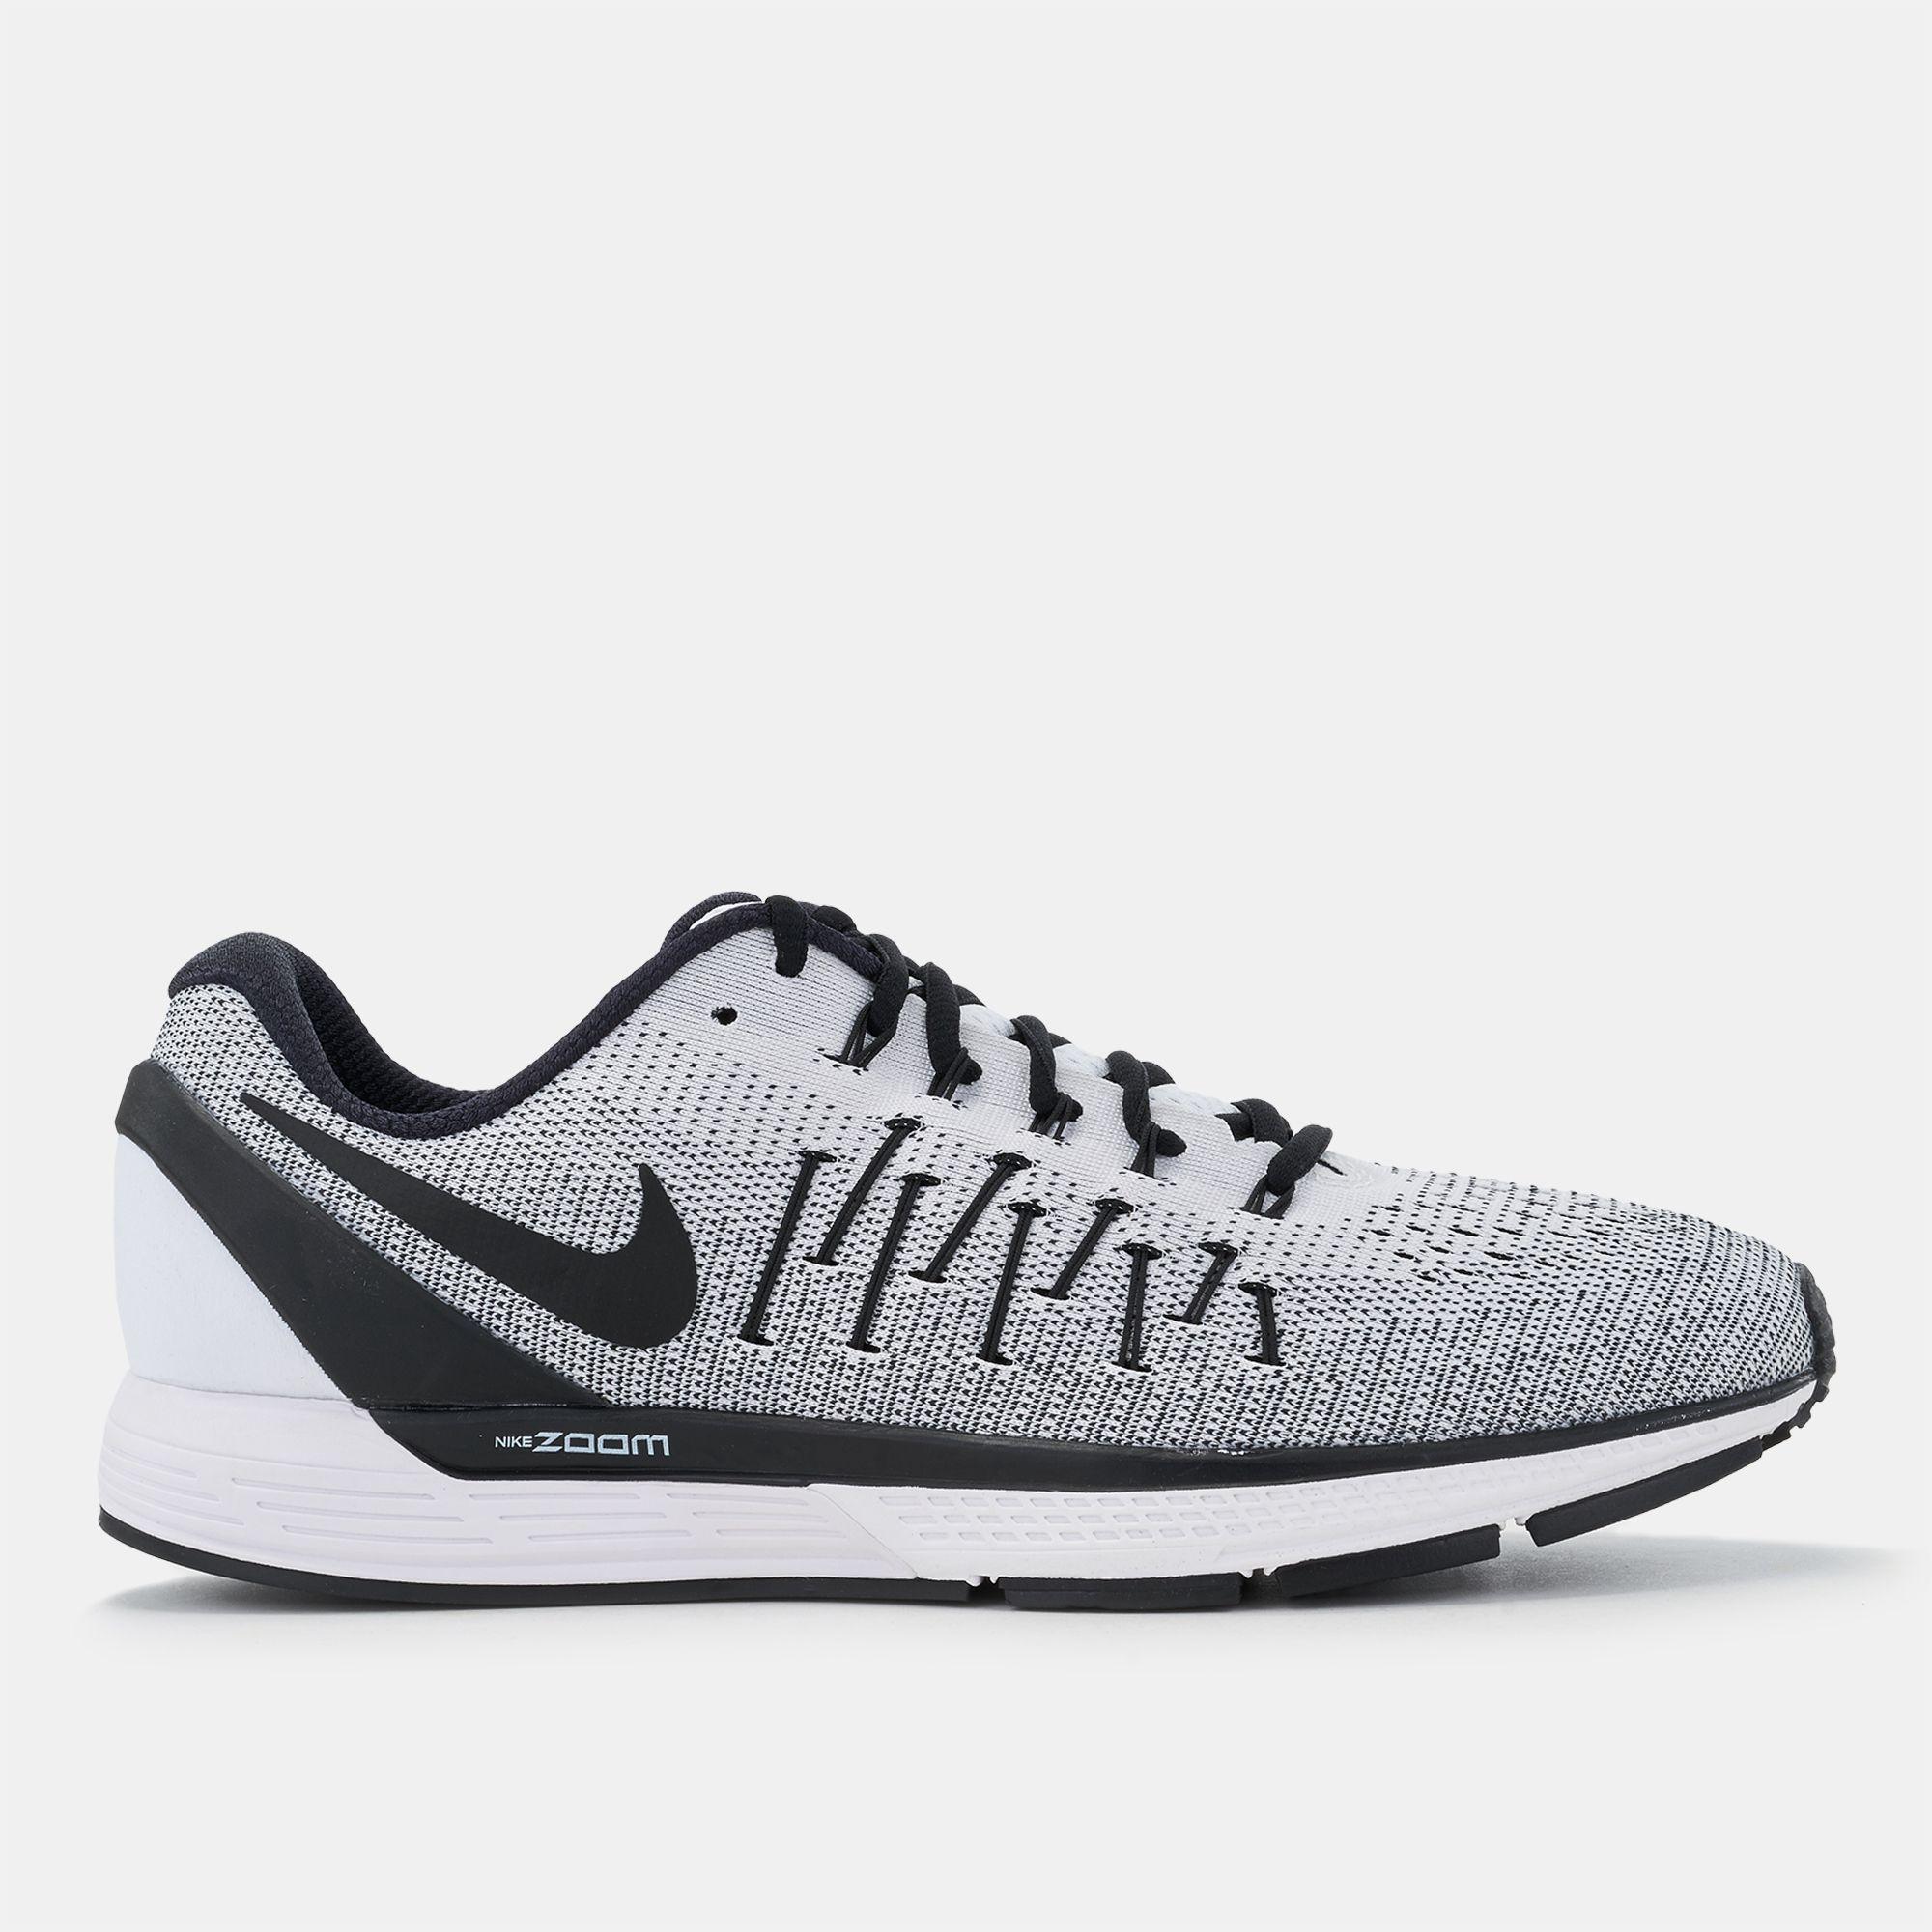 f06edc7e10a4f where can i buy black grey mens nike air odyssey shoes 9cb05 ed83a